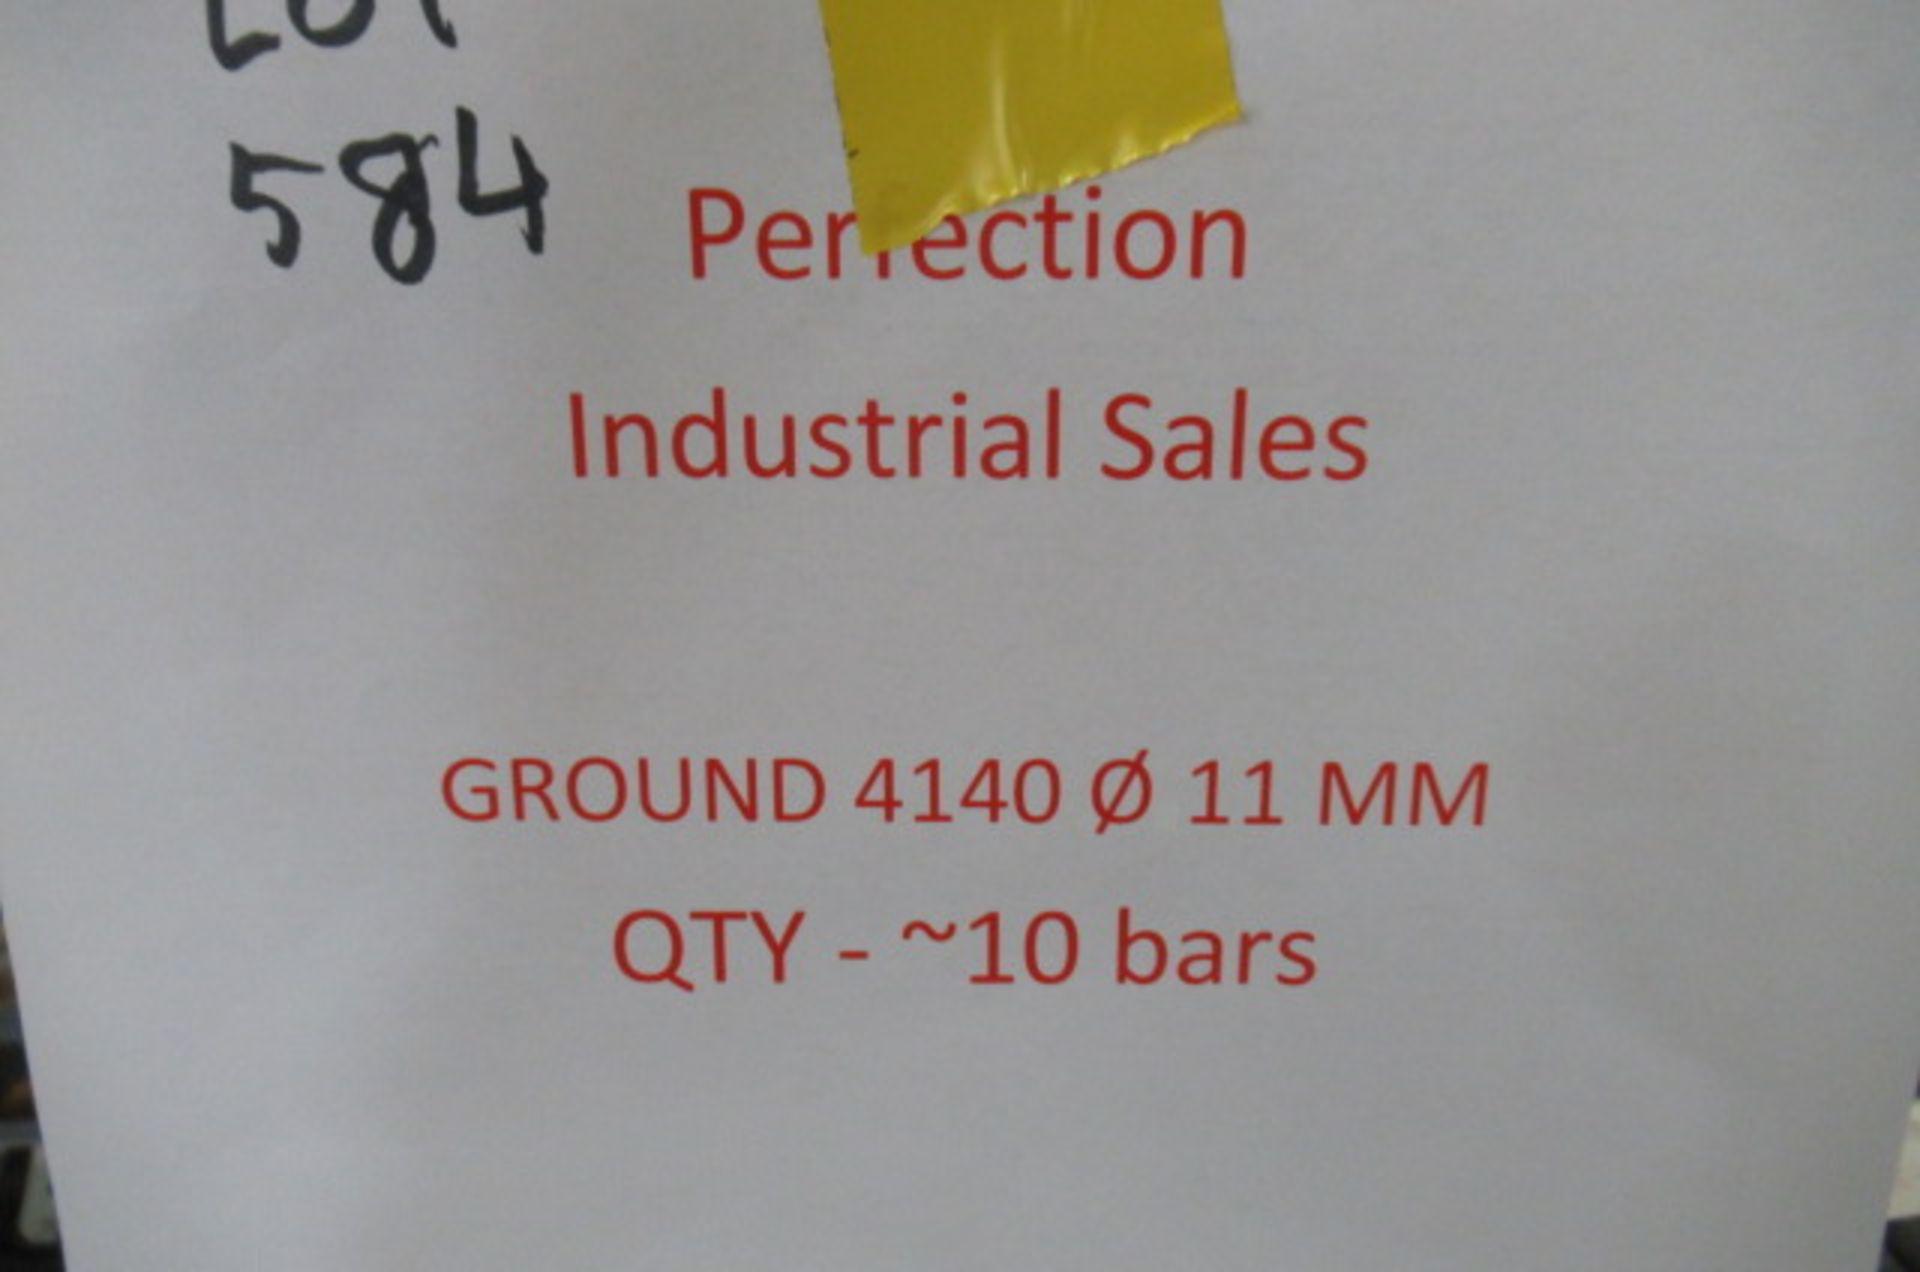 Lot steel round stock ground 4140 011 qty 10